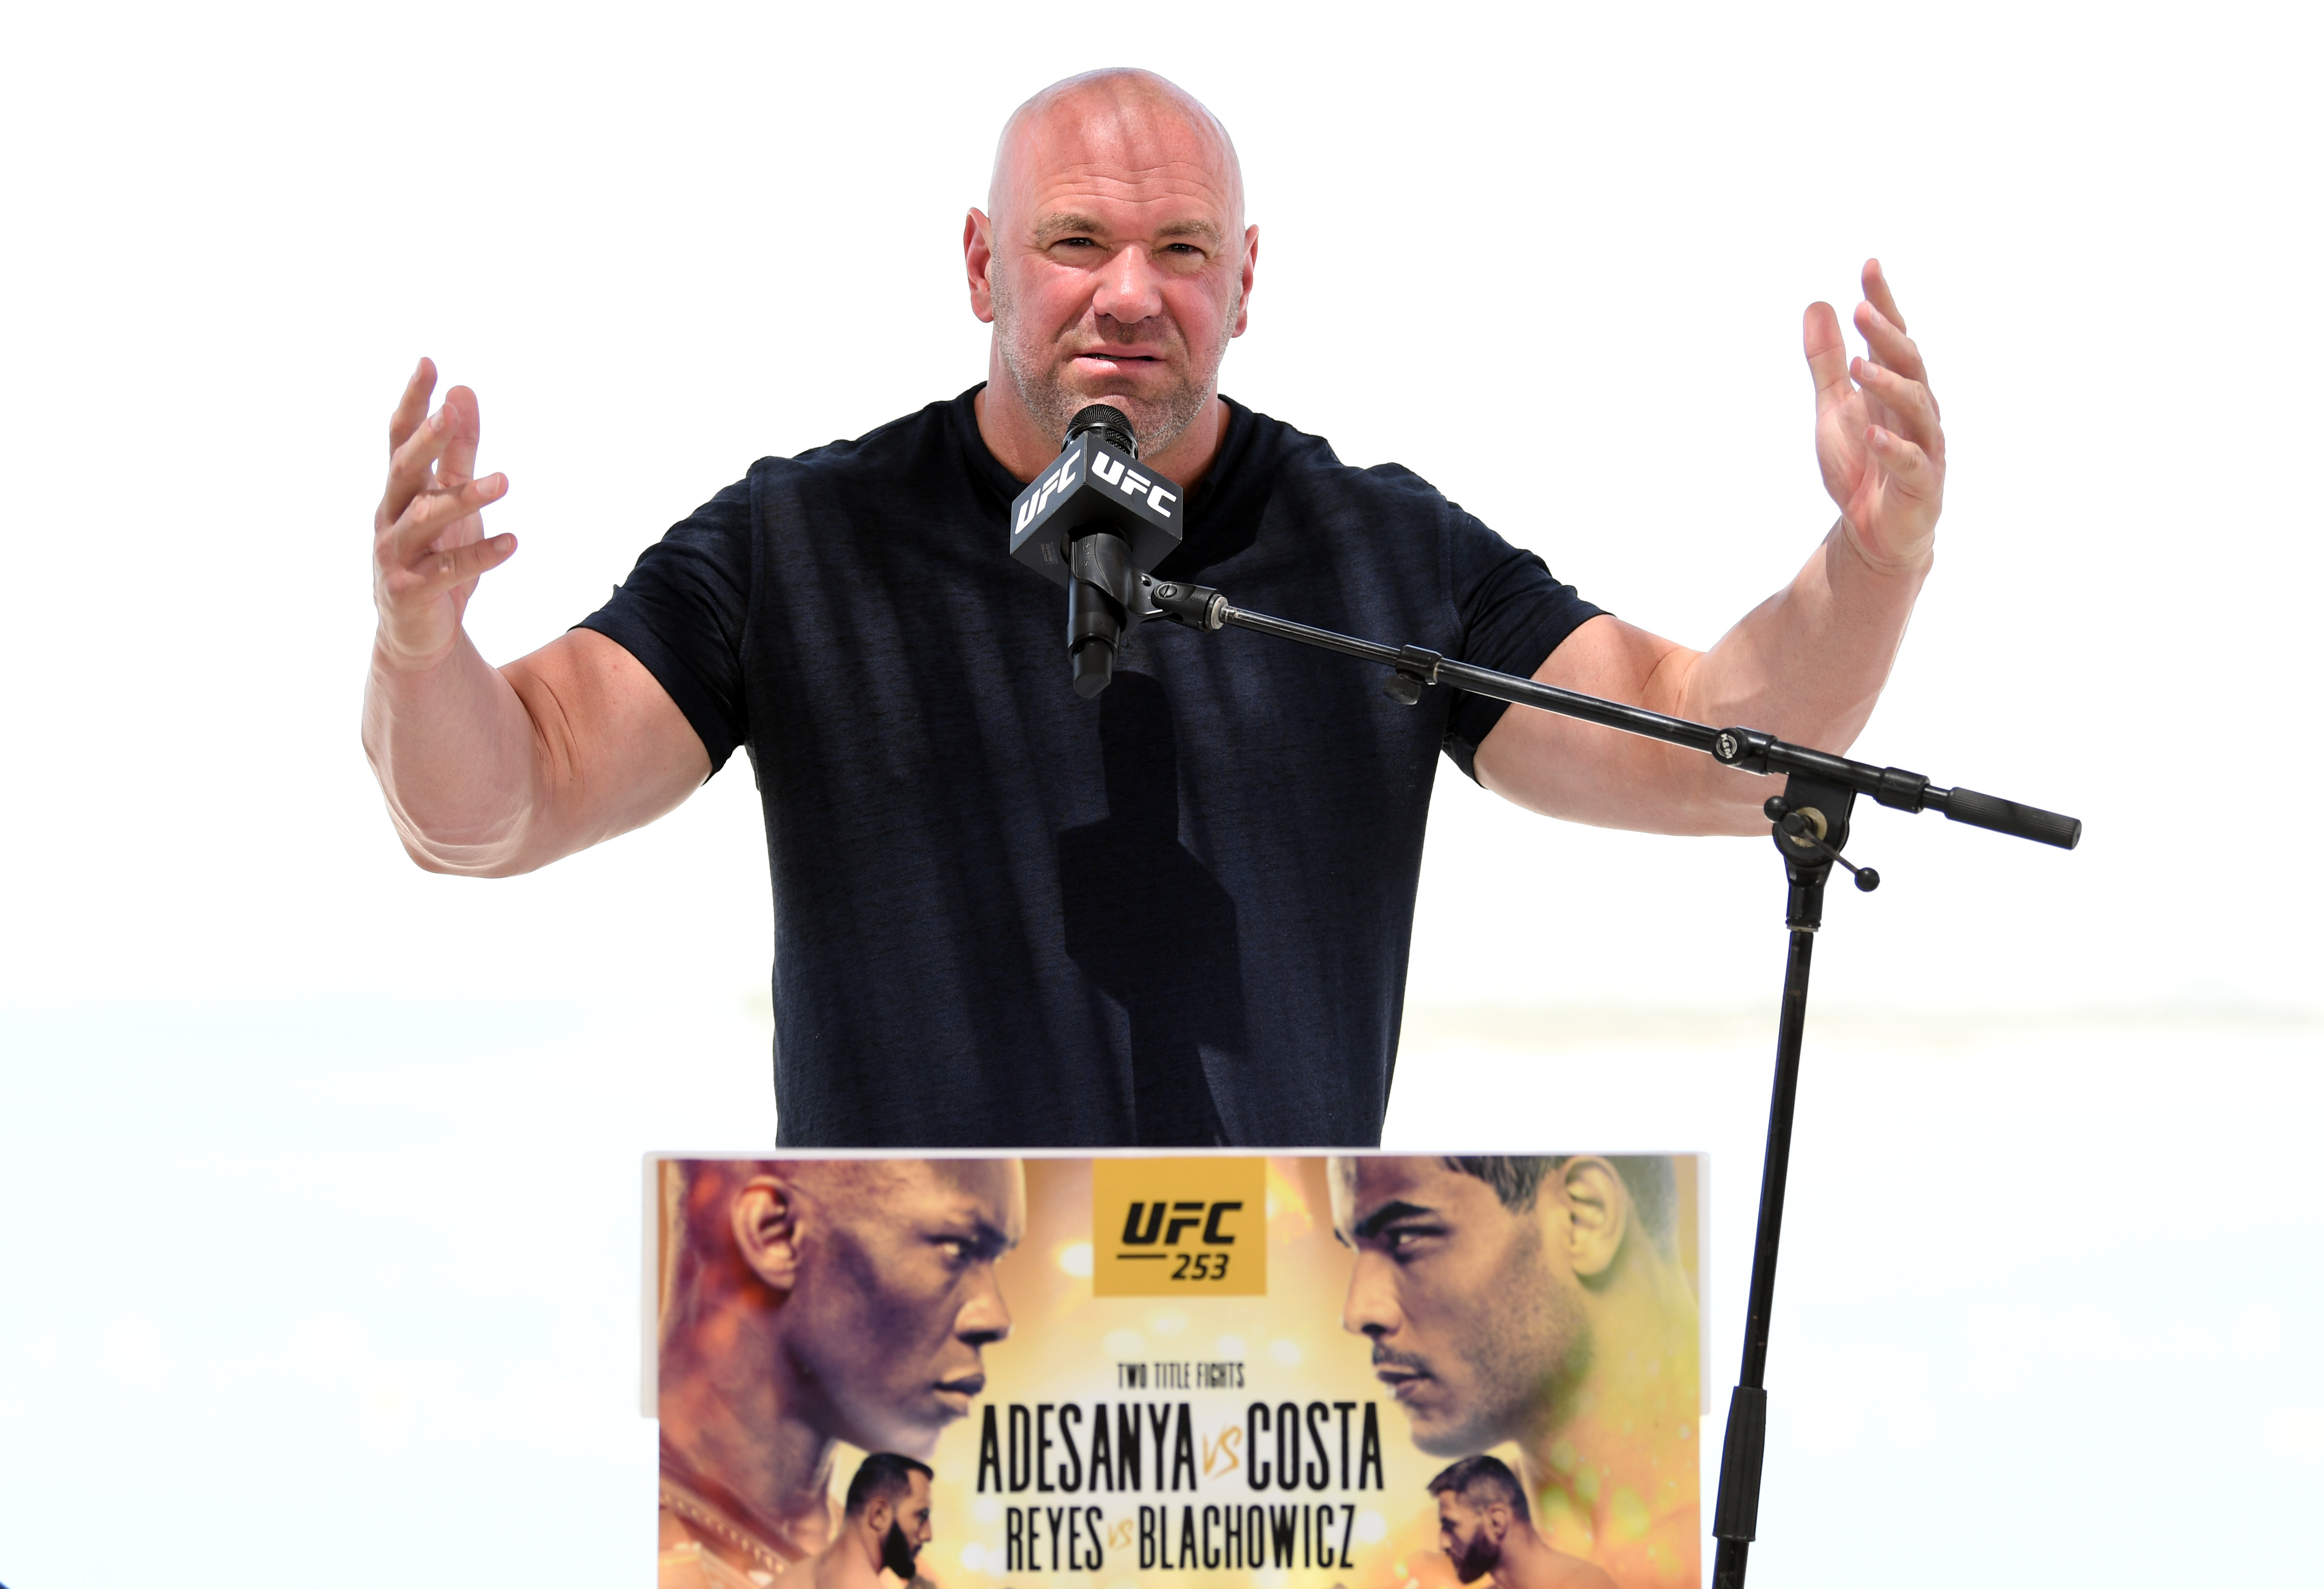 UFC president Dana White was not the mastermind behind Fight Island